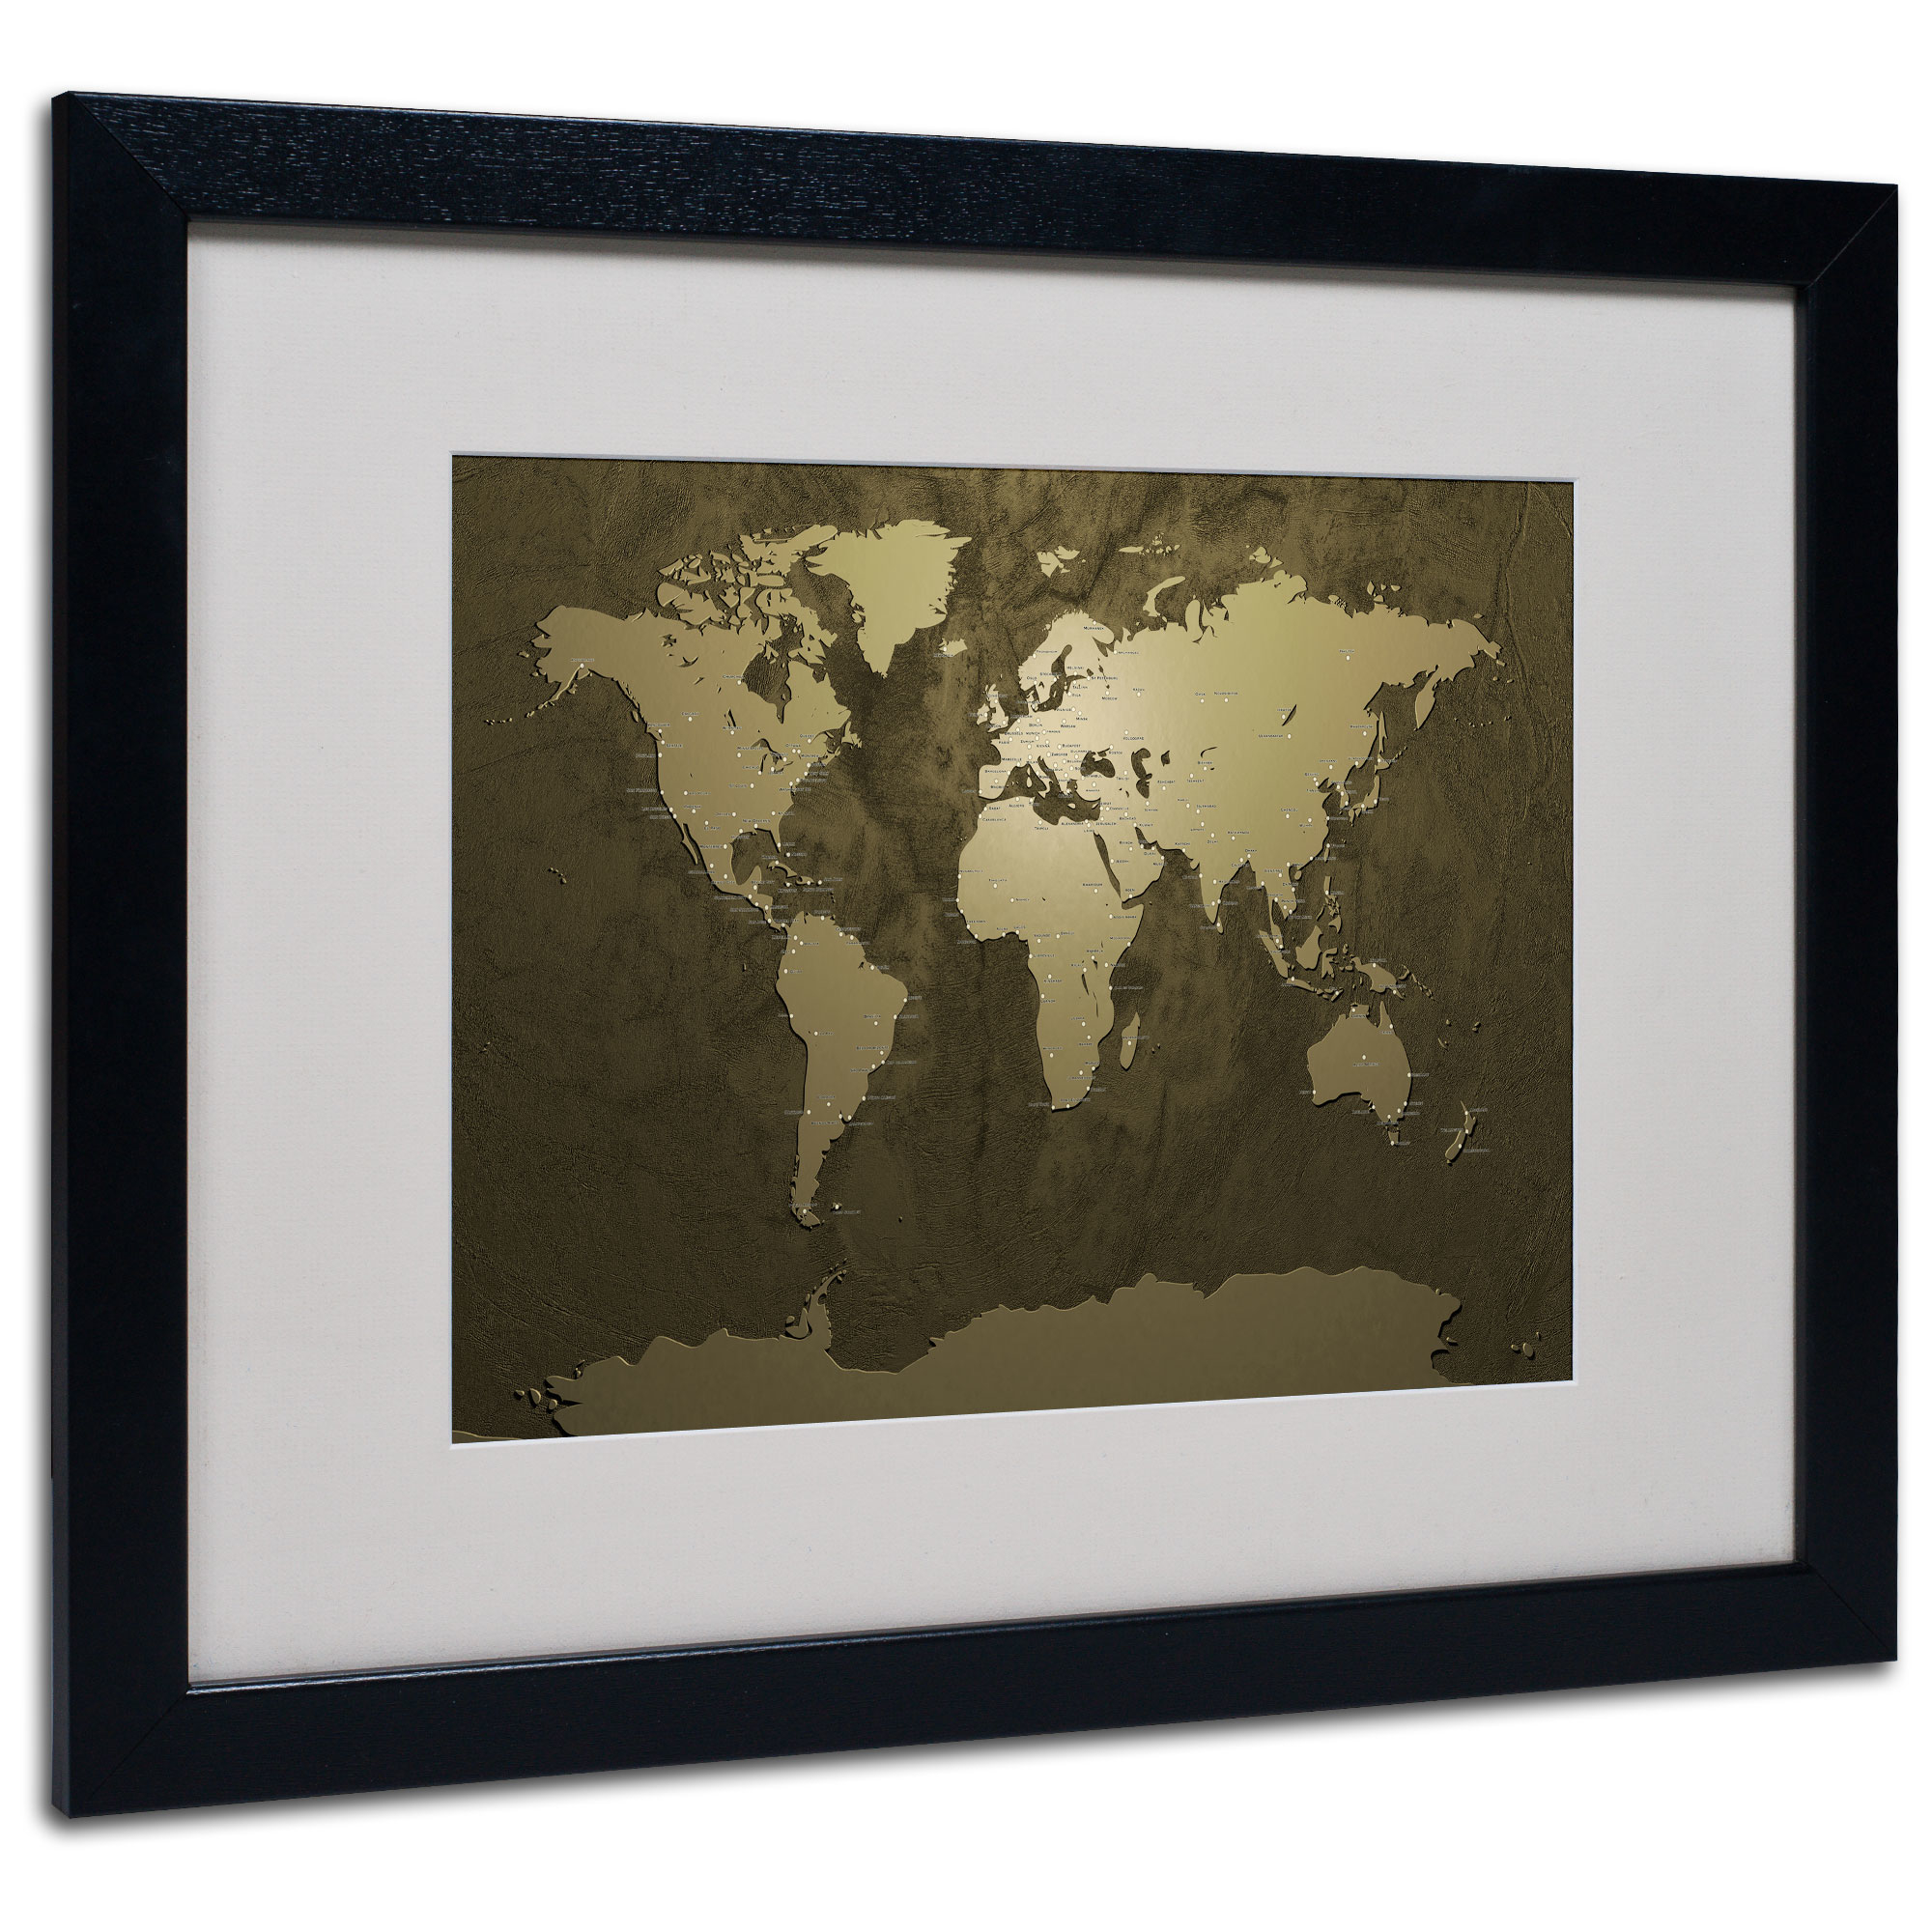 Michael Tompsett 'Gold World Map' Black Wooden Framed Art 18 x 22 Inches